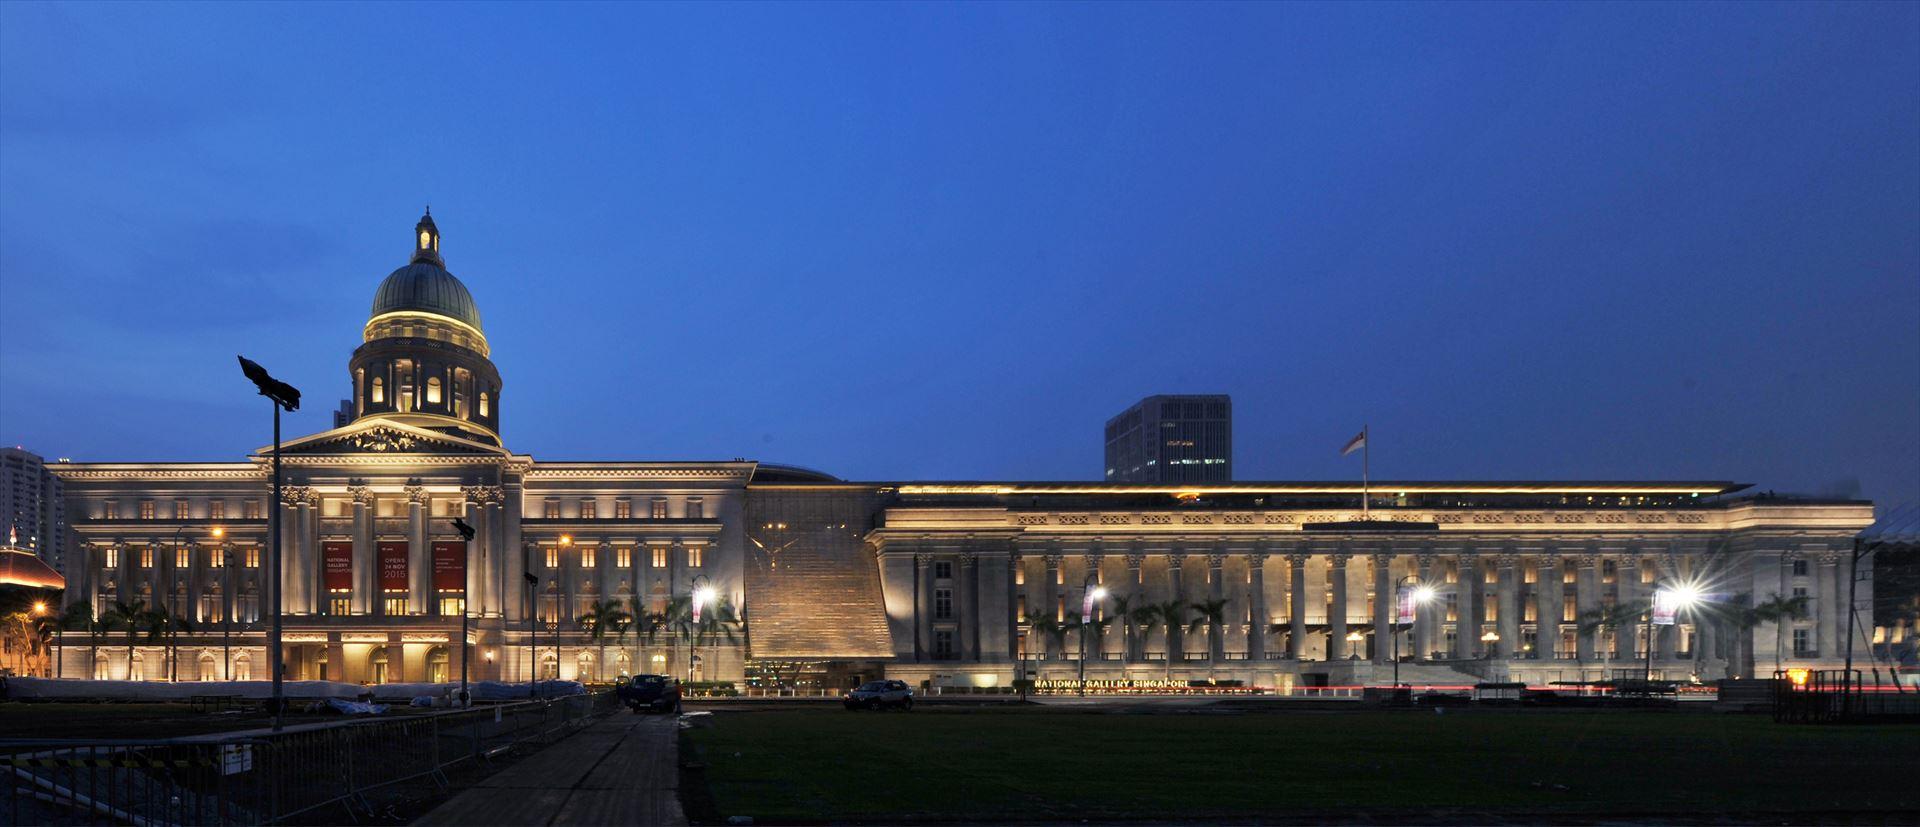 "IES illumination Awards / Award of Merit for ""National Gallery Singapore"" 2016"